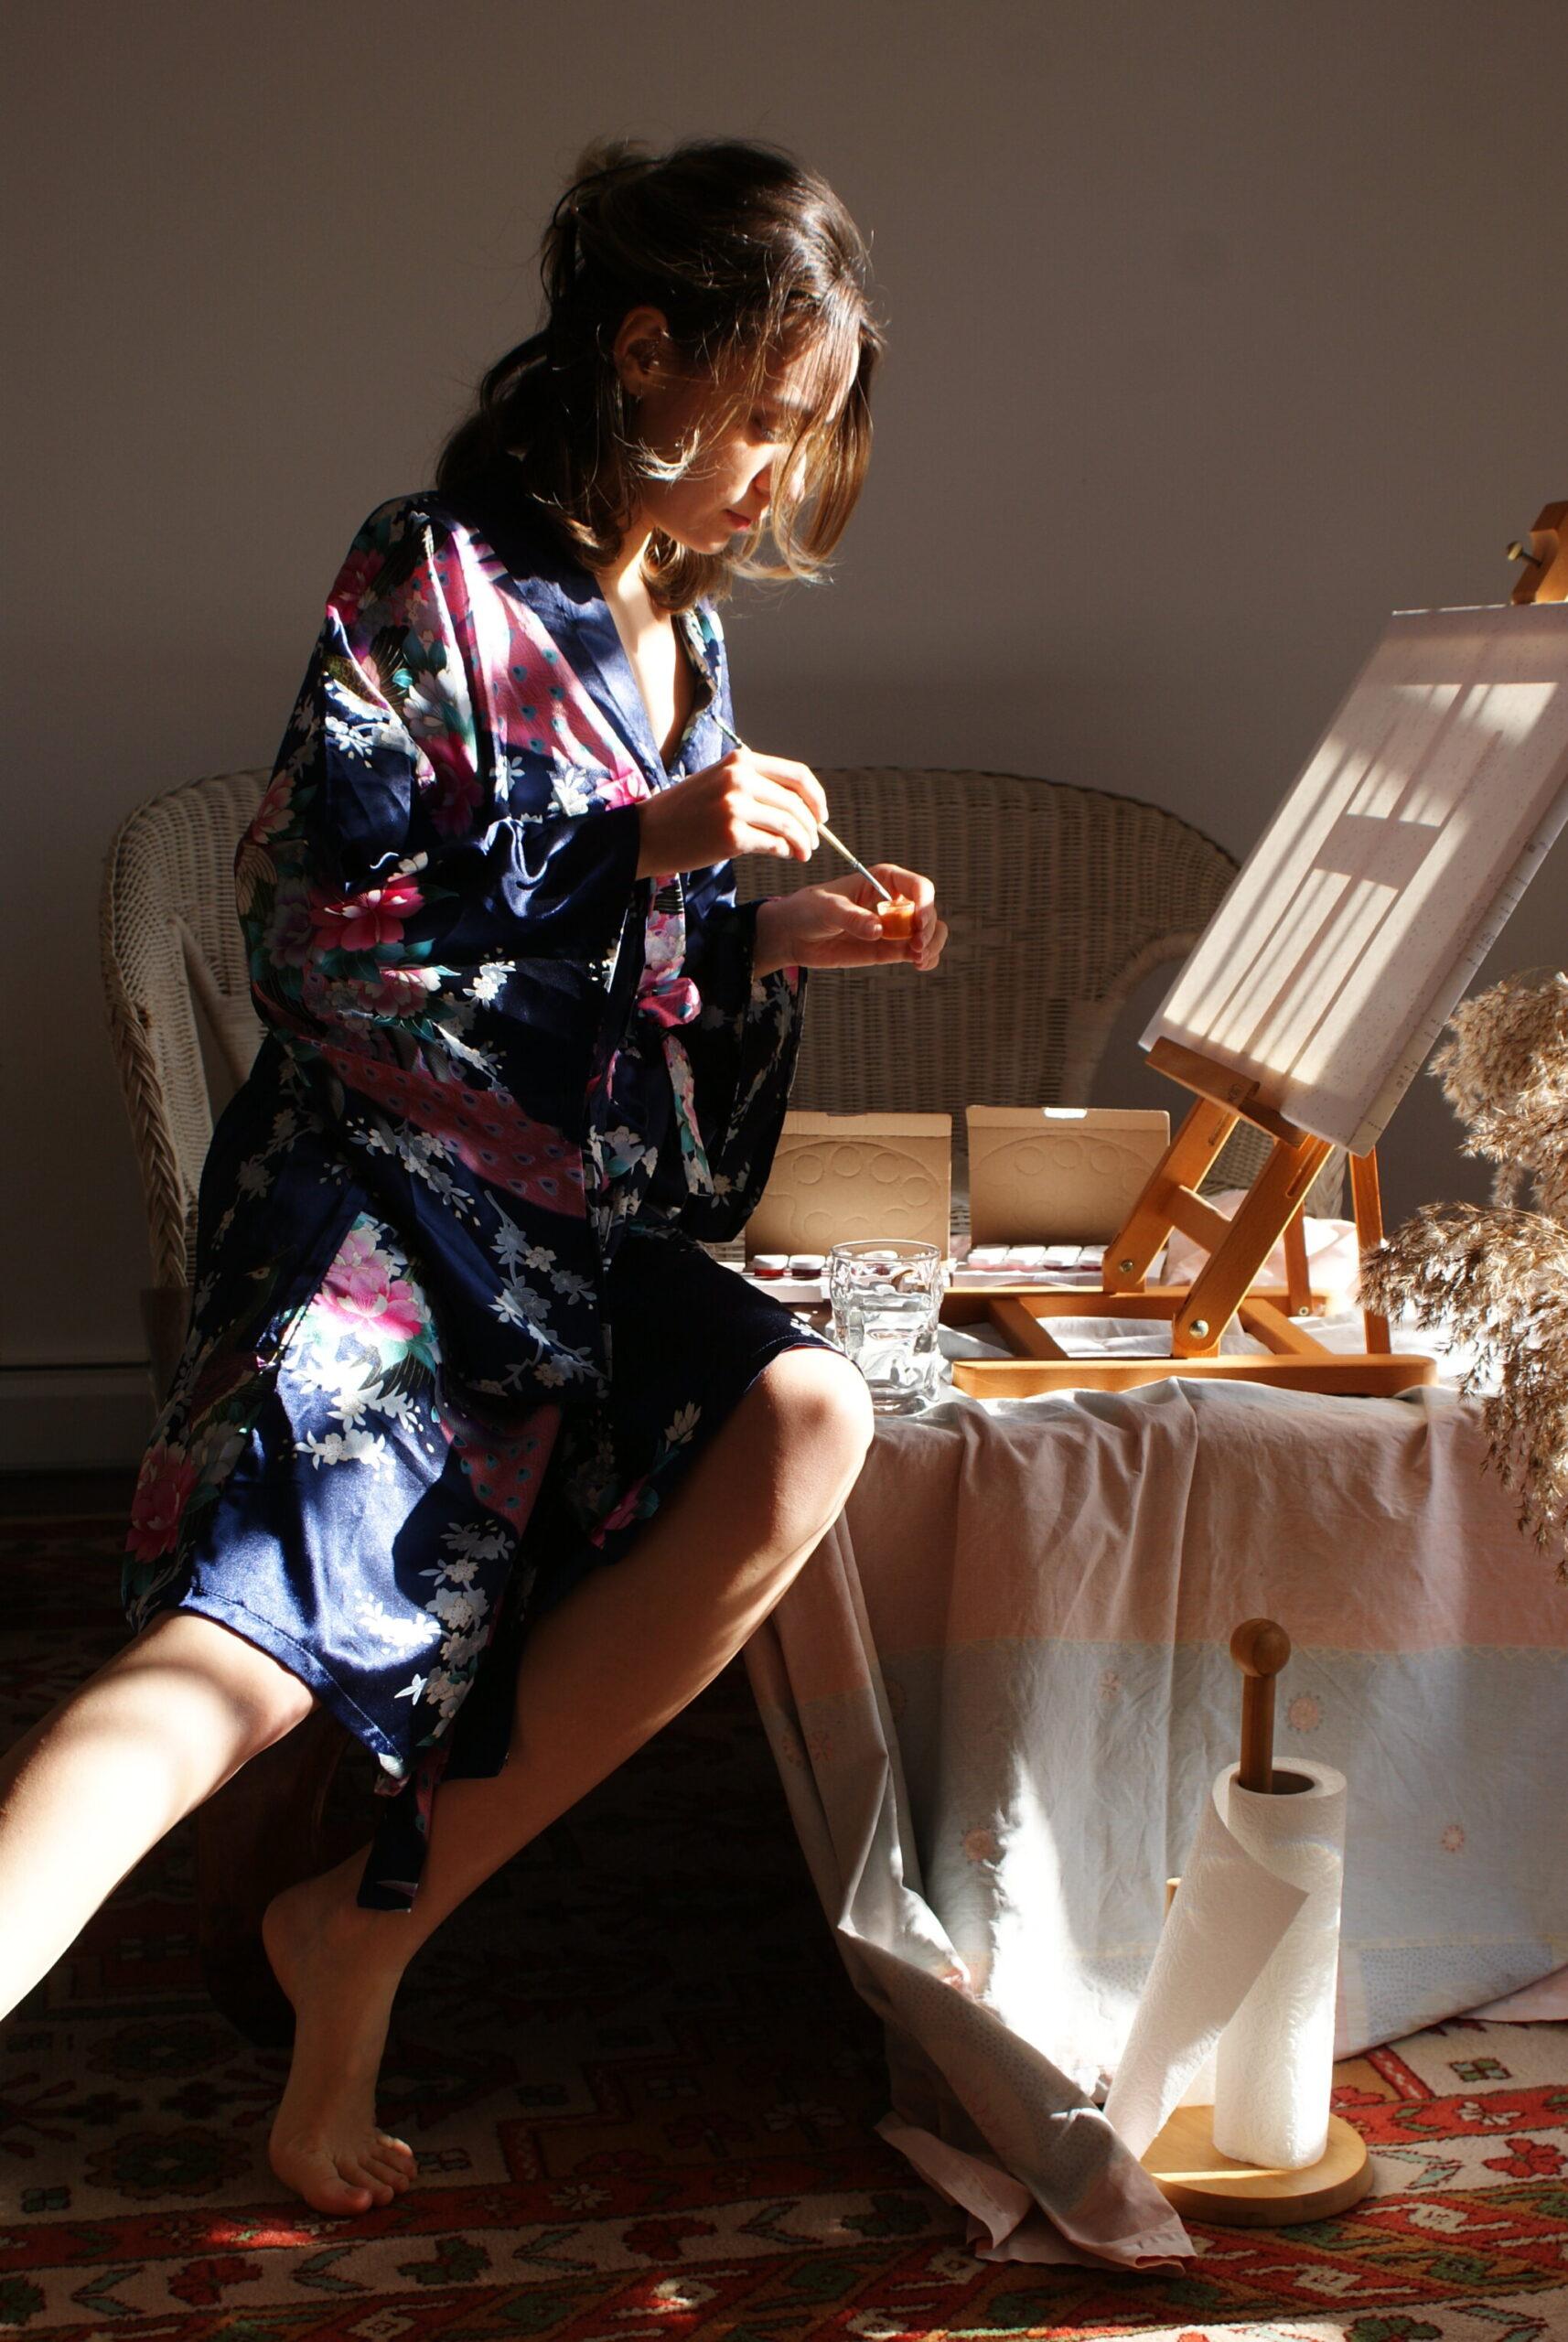 elisa diy lifestyle blogger italy milan creativa fai da te italiana